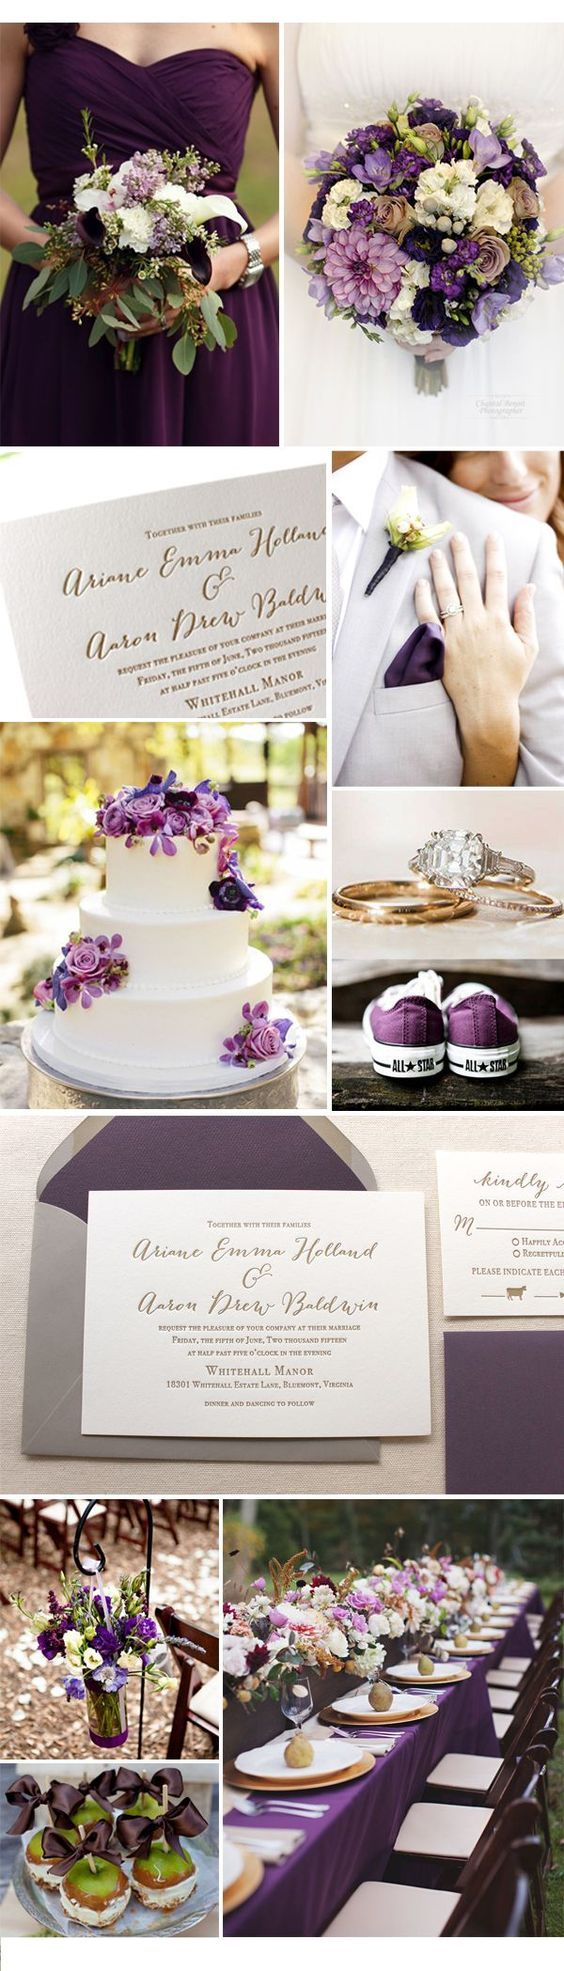 Wildflower Letterpress Printed Wedding Invitation | Purple wedding ...